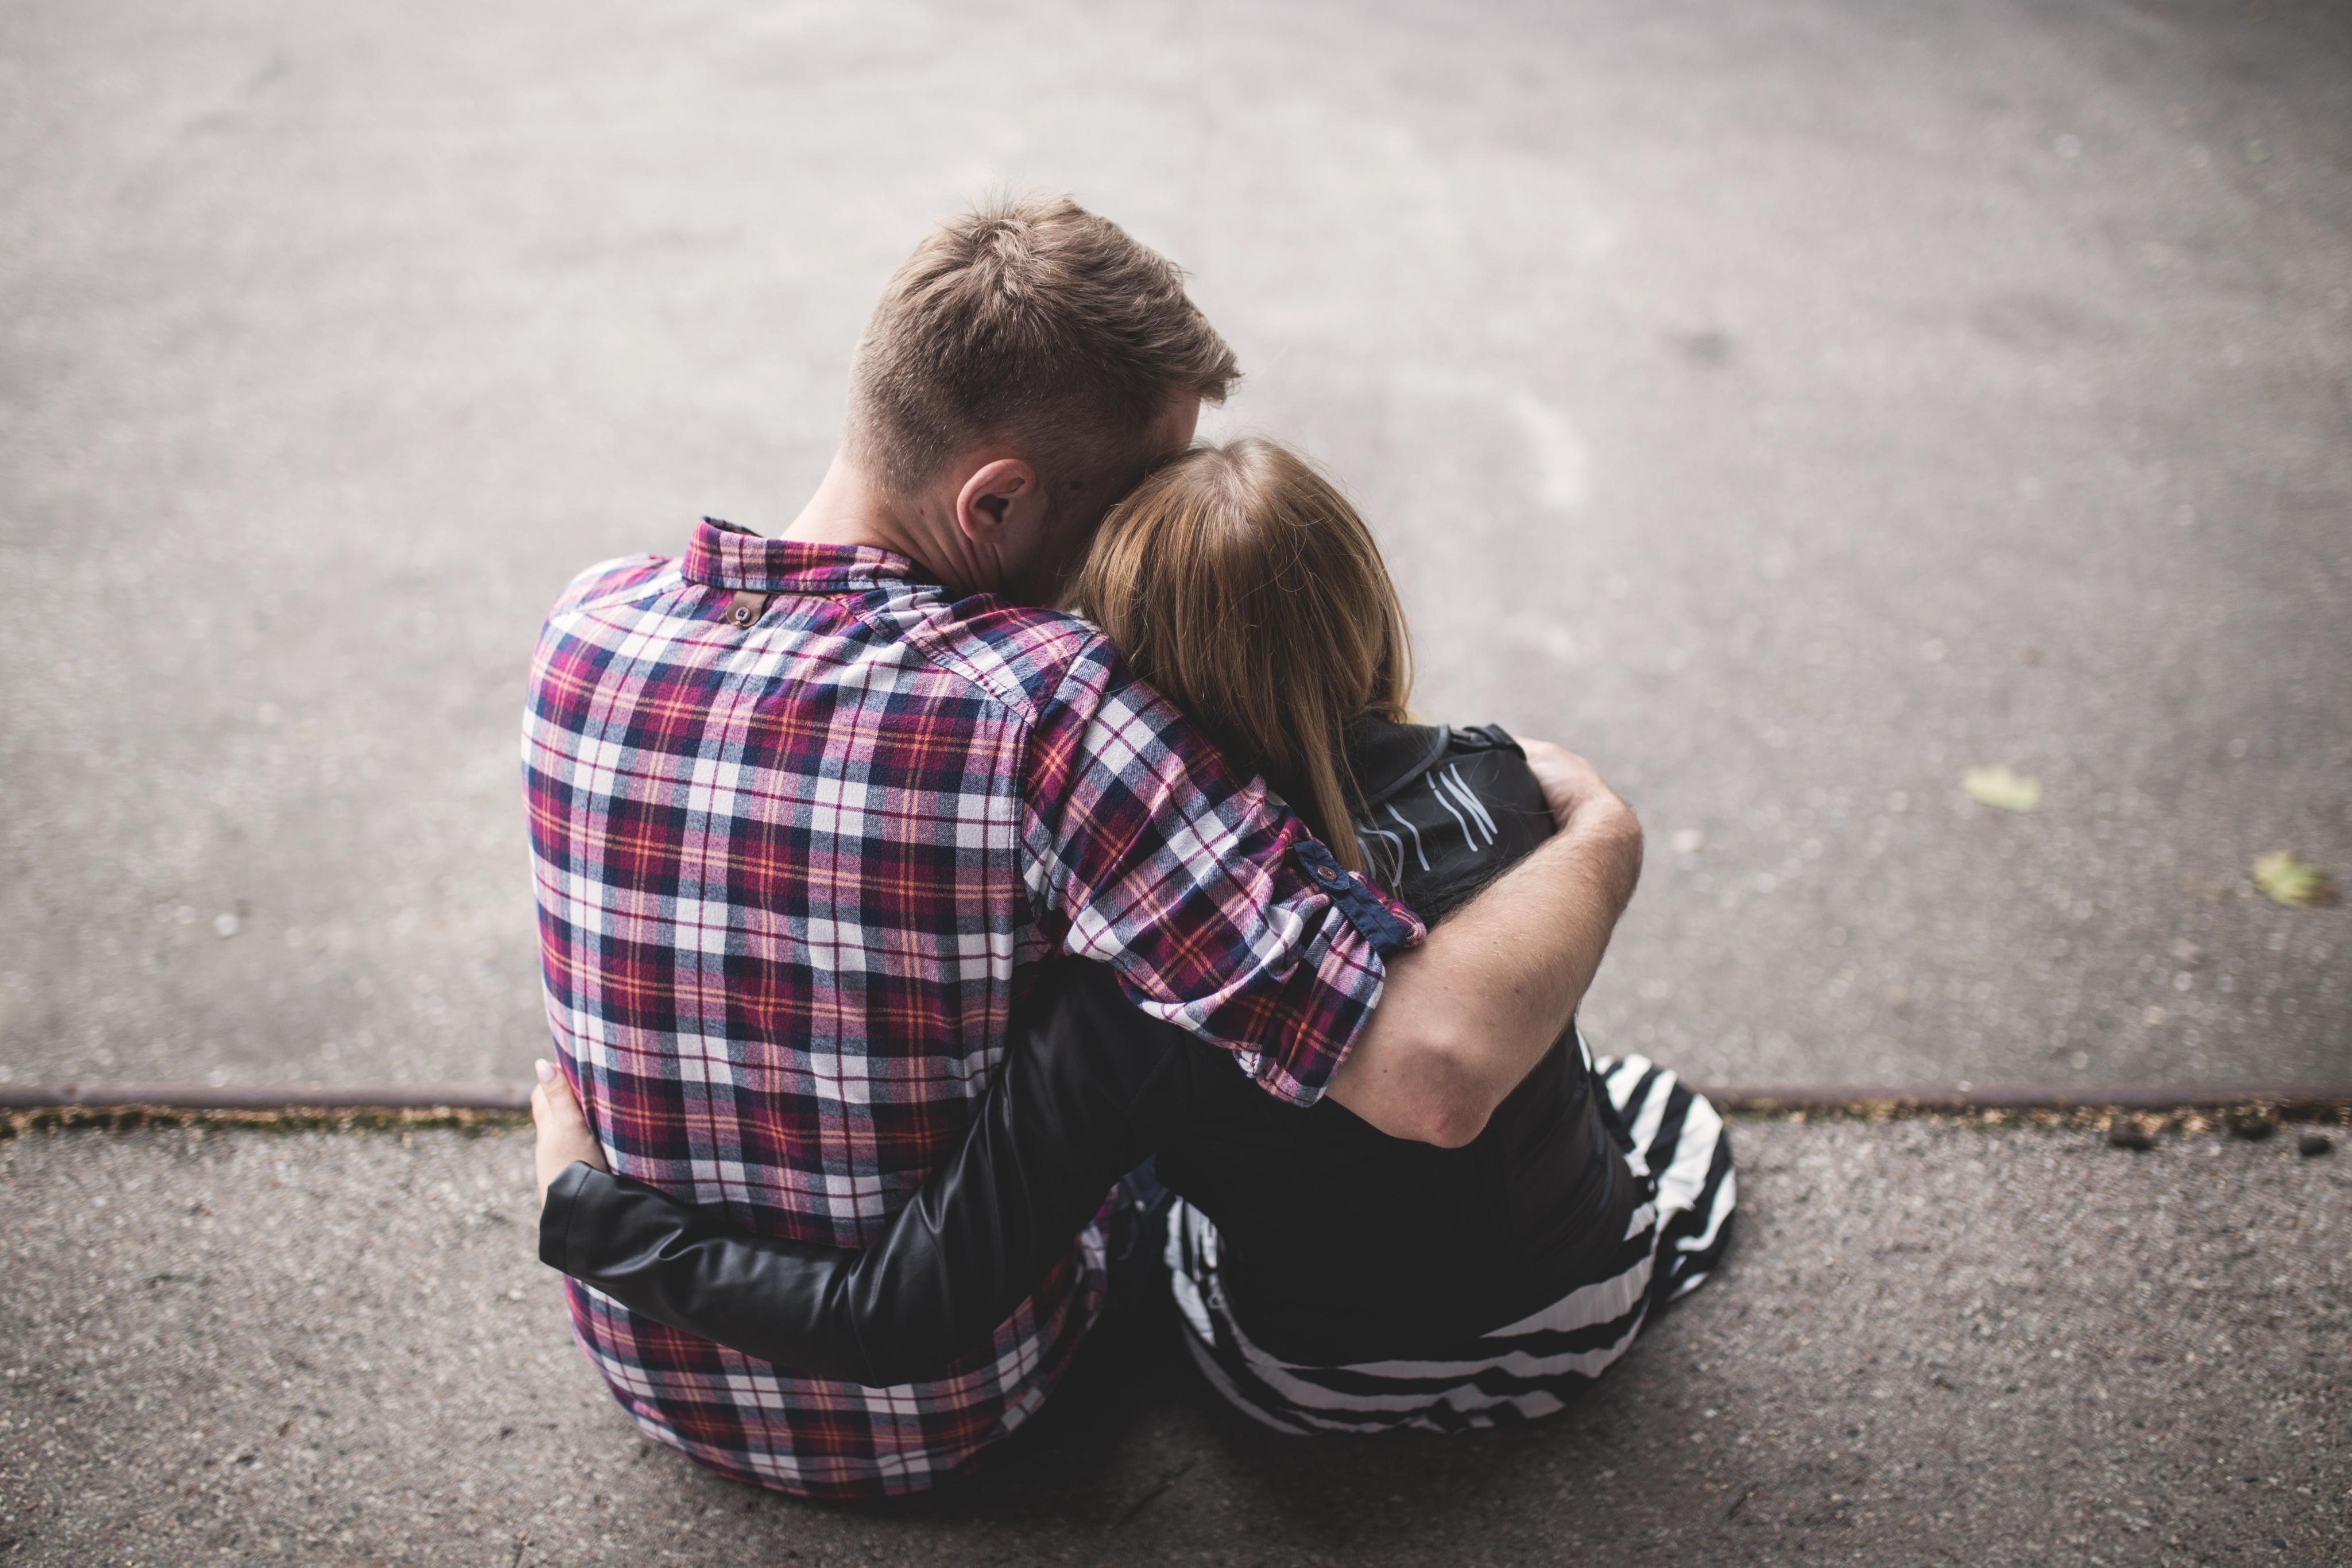 pár - vztah - milenci